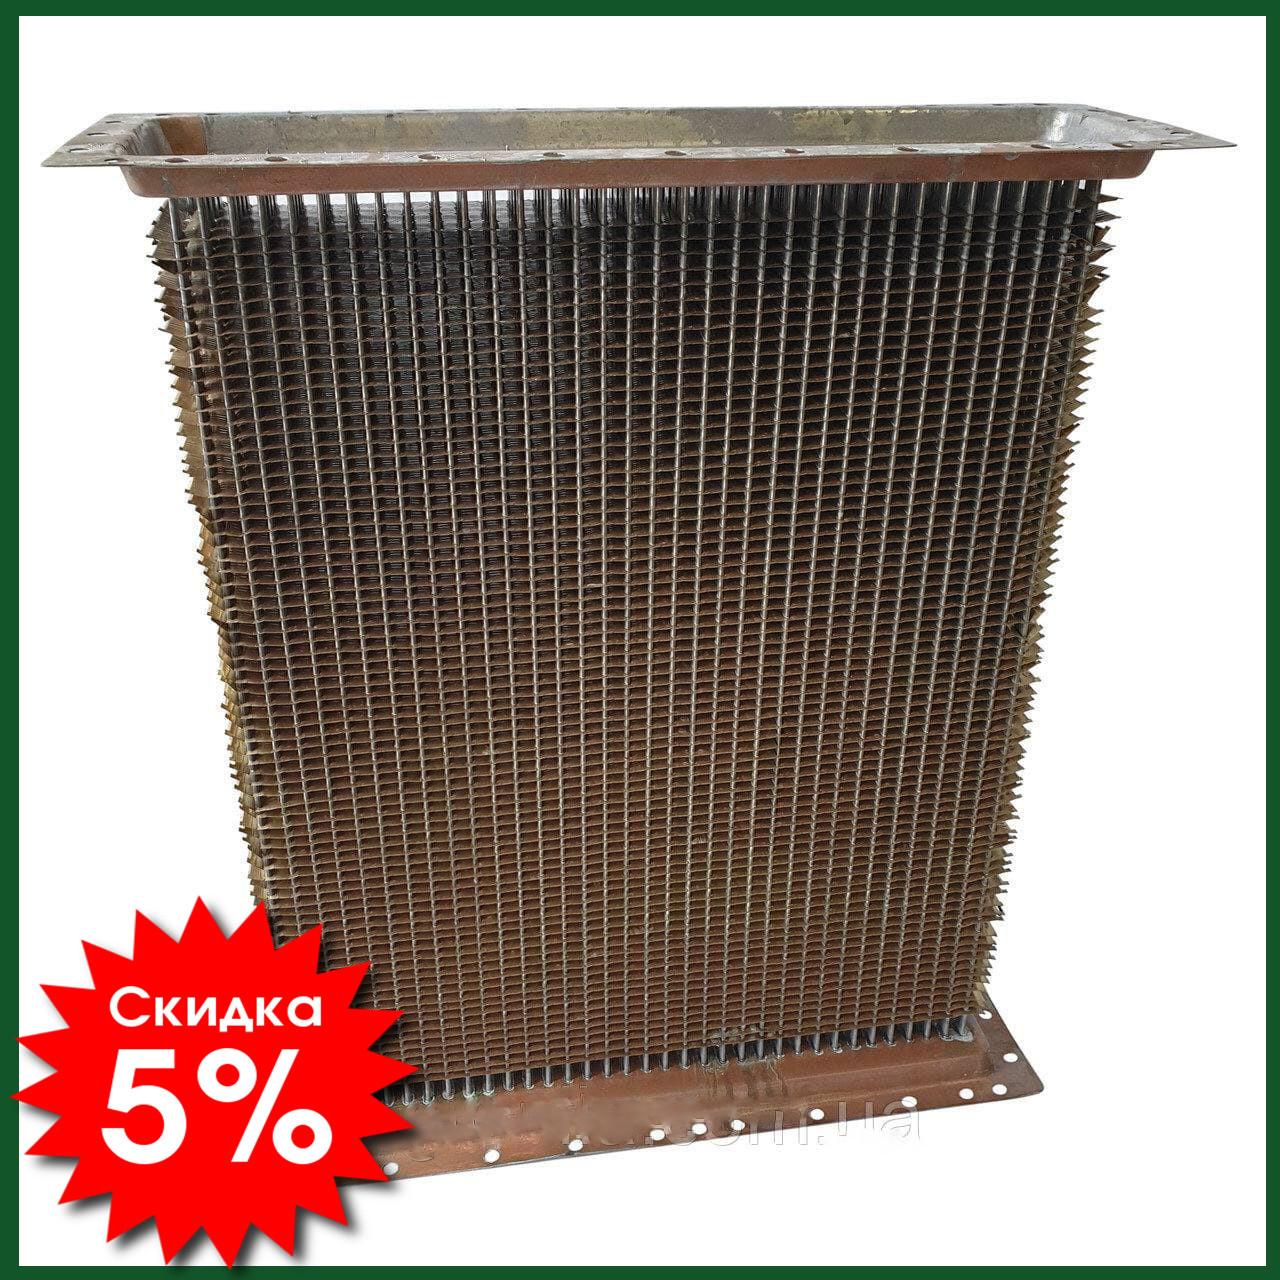 Серцевина радіатора МТЗ, Д-240, Д243 латунна